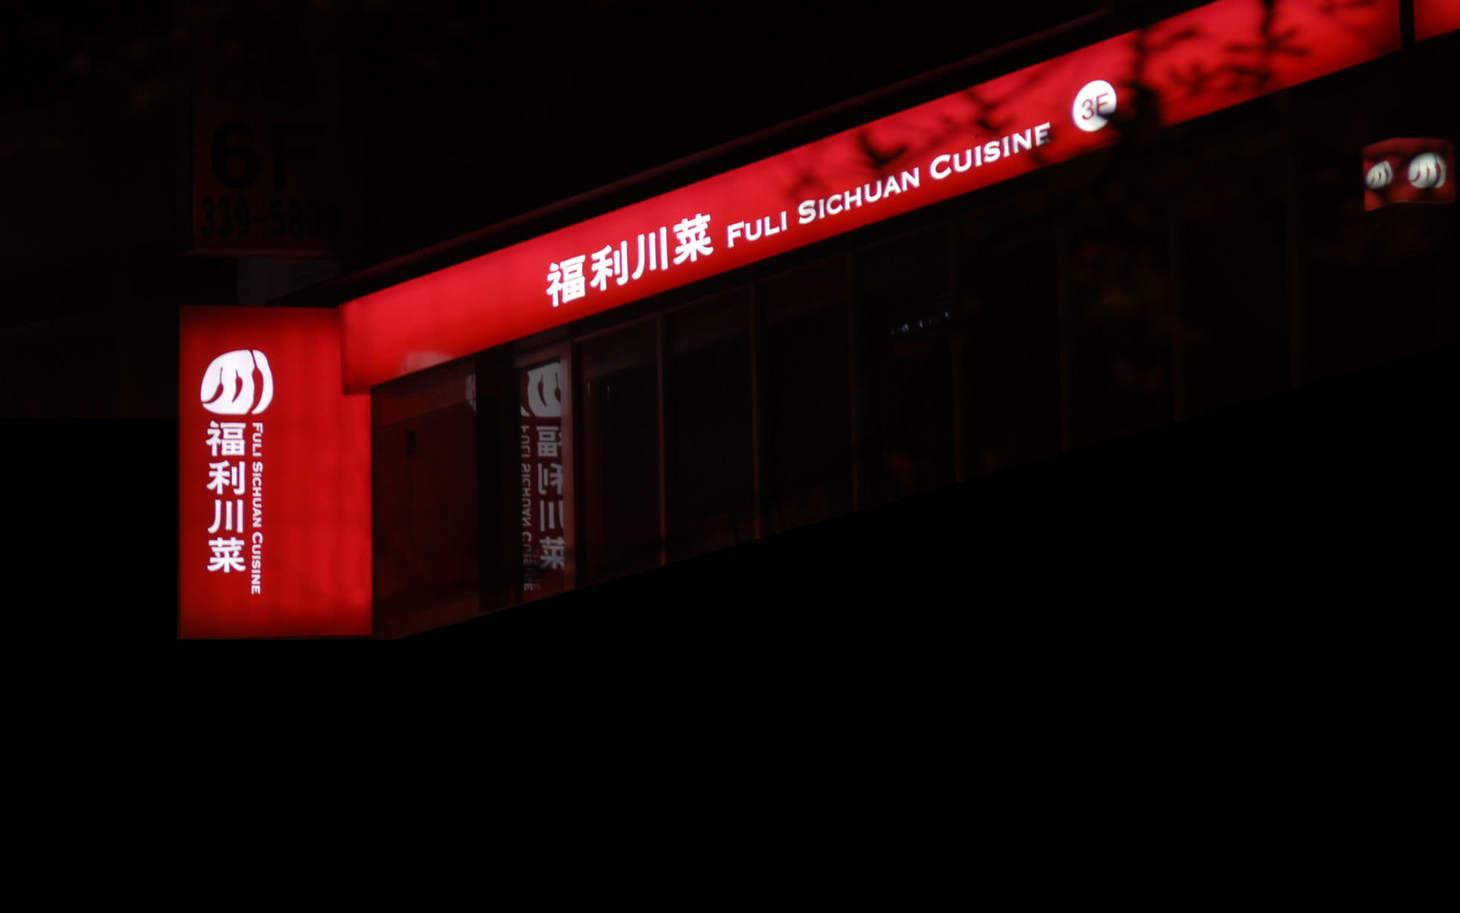 FULI_signage_20150225.jpg